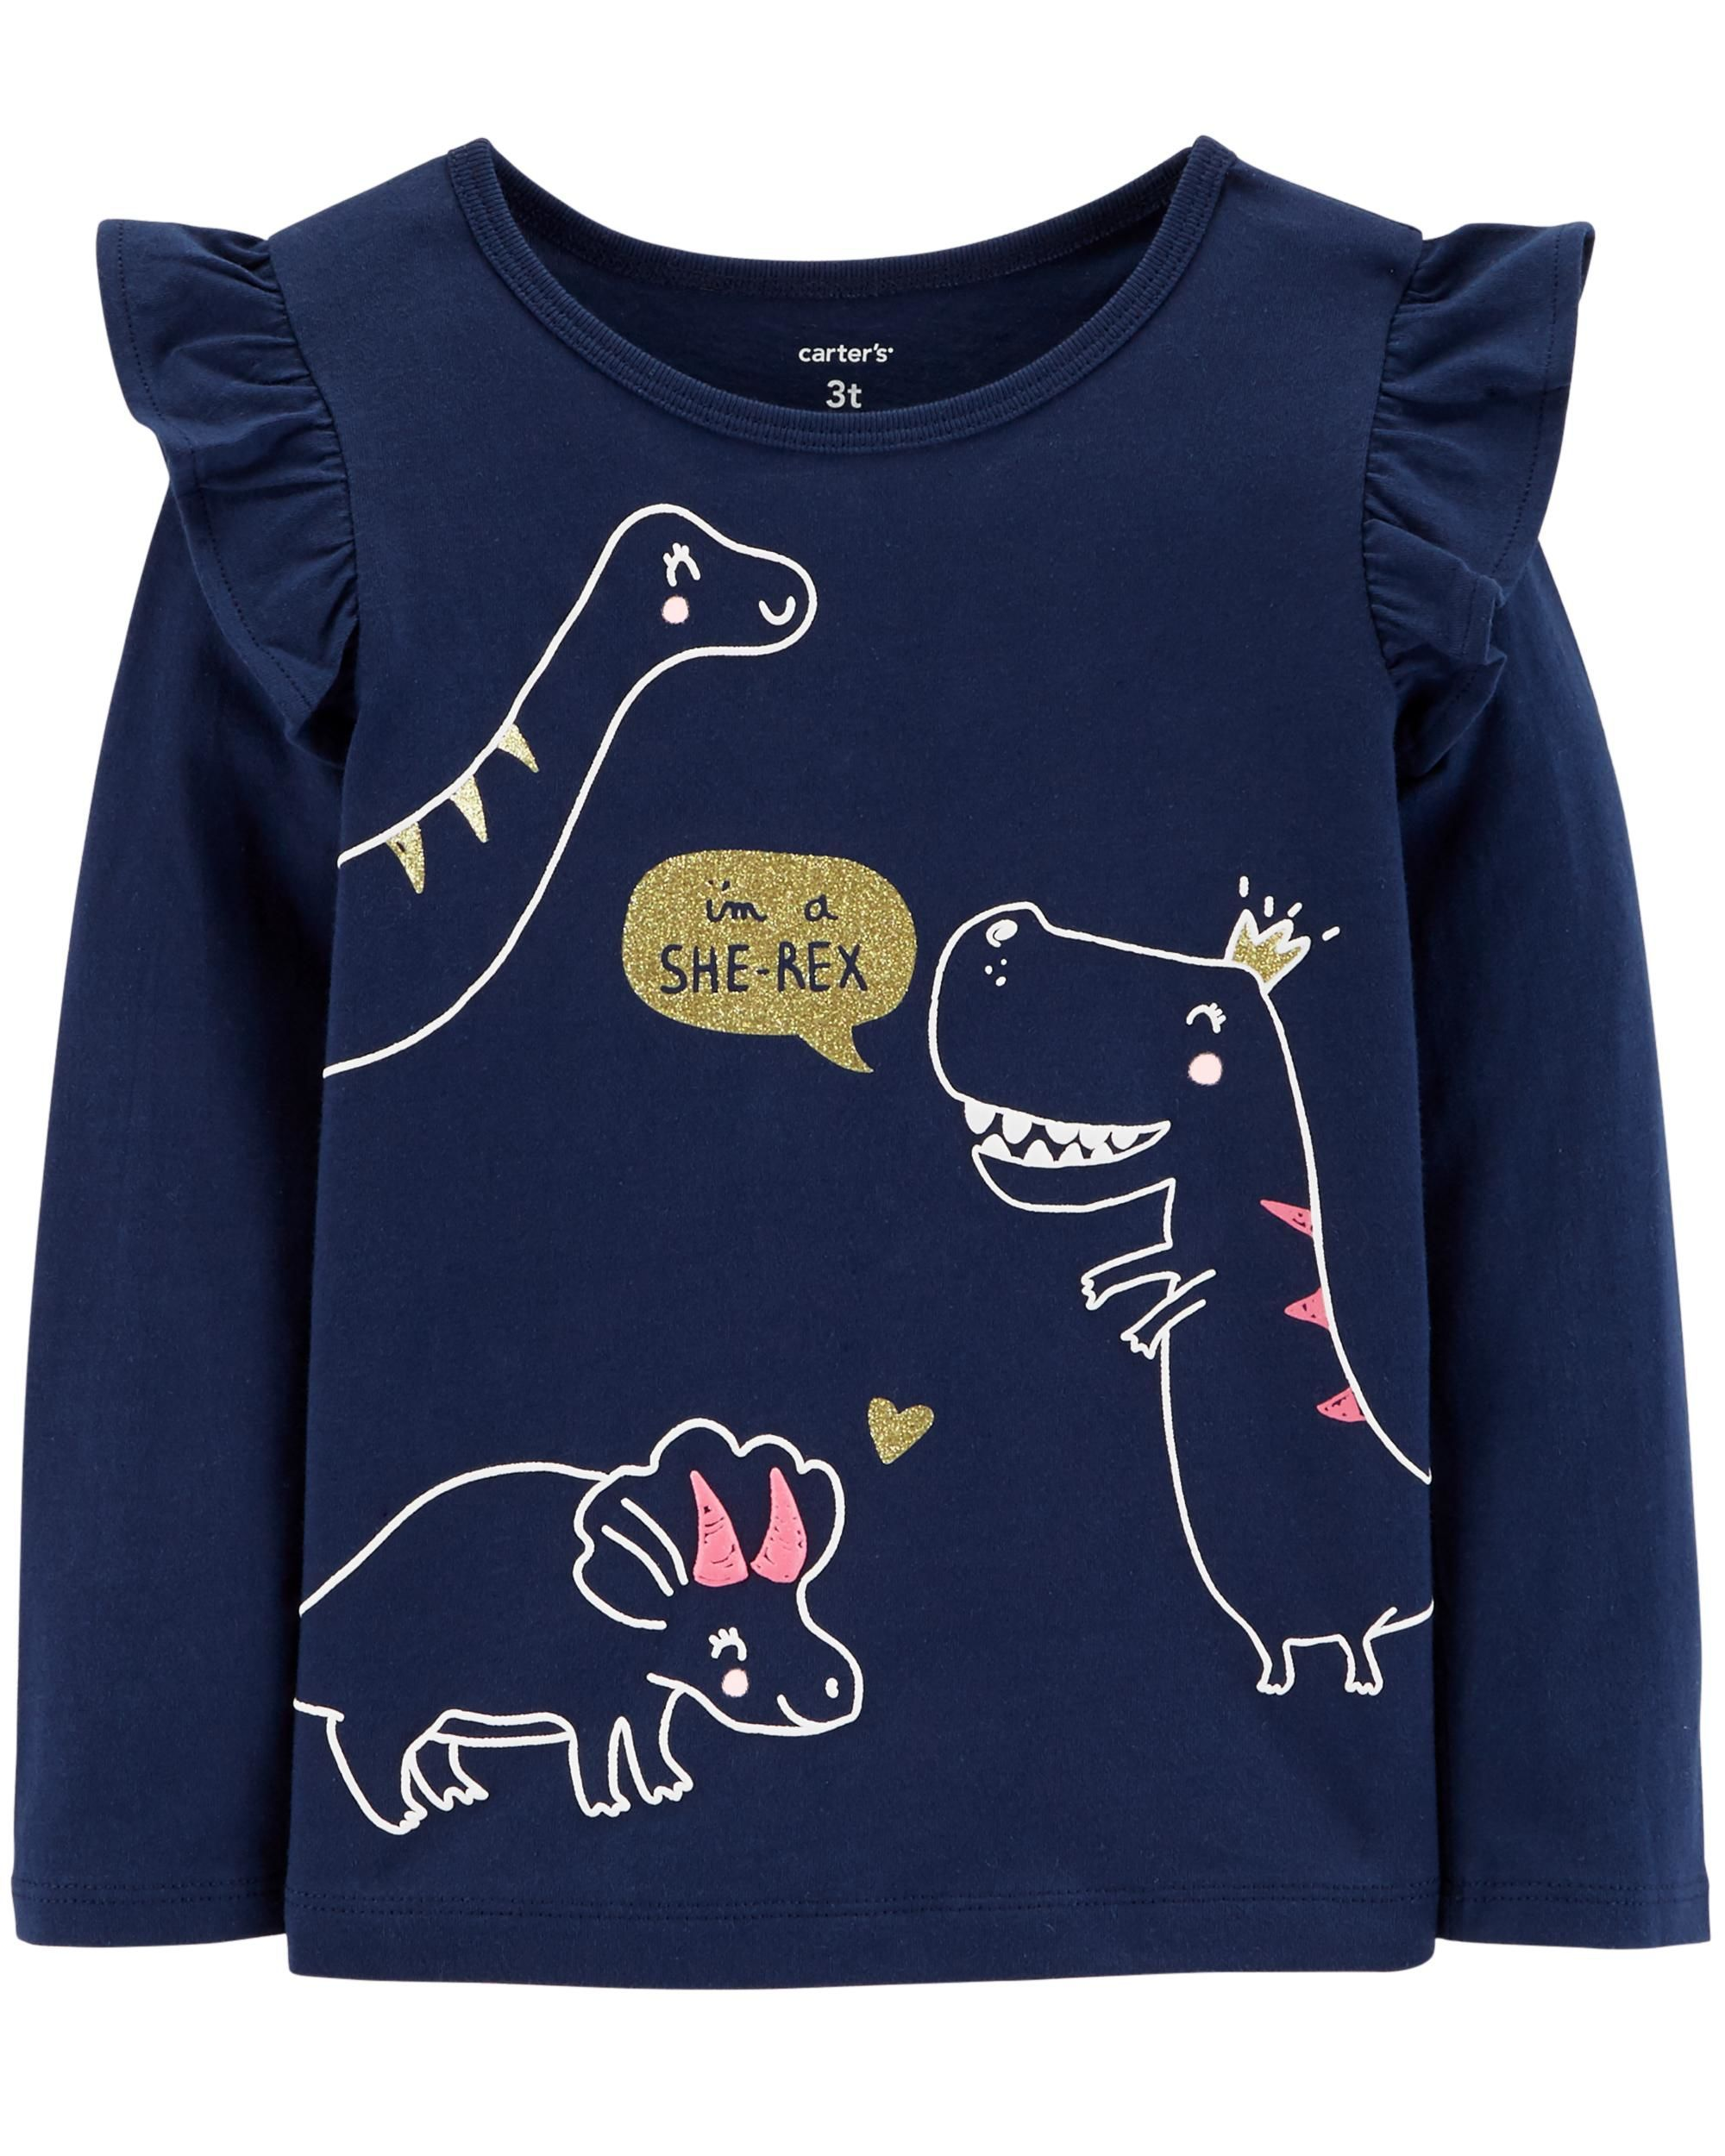 7a9bf50b5 Baby Girl Dinosaur Flutter Matchtastic Top